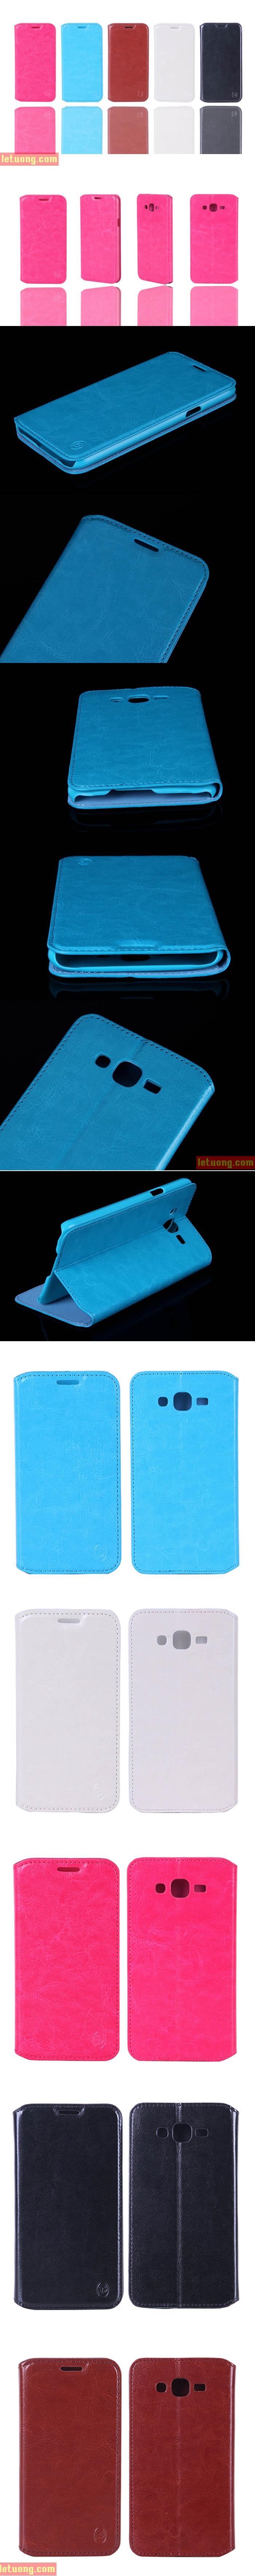 Bao da Samsung Galaxy J7 Boso Leather mỏng gọn, thời trang 6